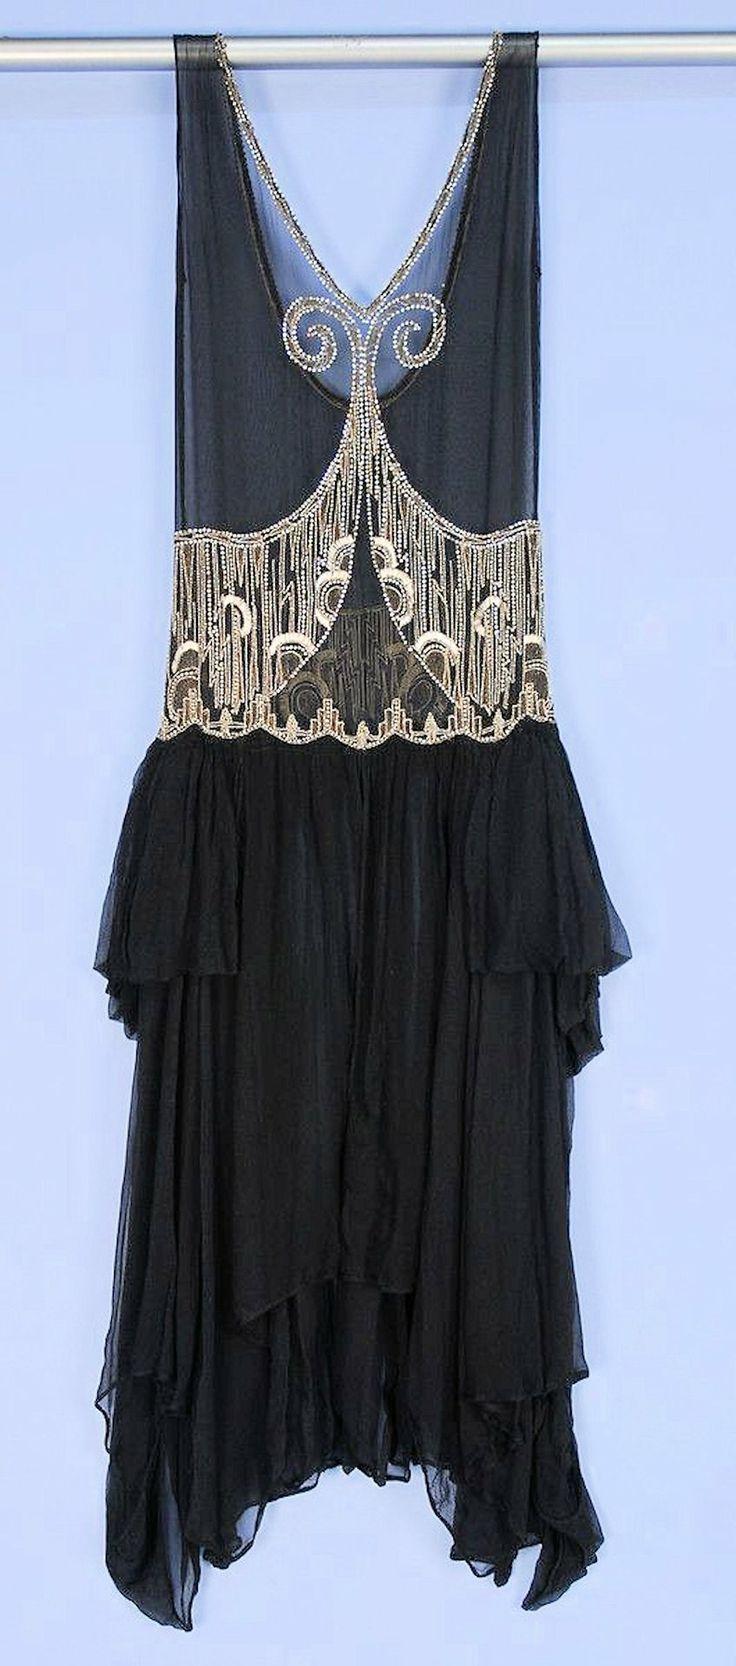 1920s Deco beaded chiffon dress sold at Whitaker Auctions, via Husk, du skal dø.